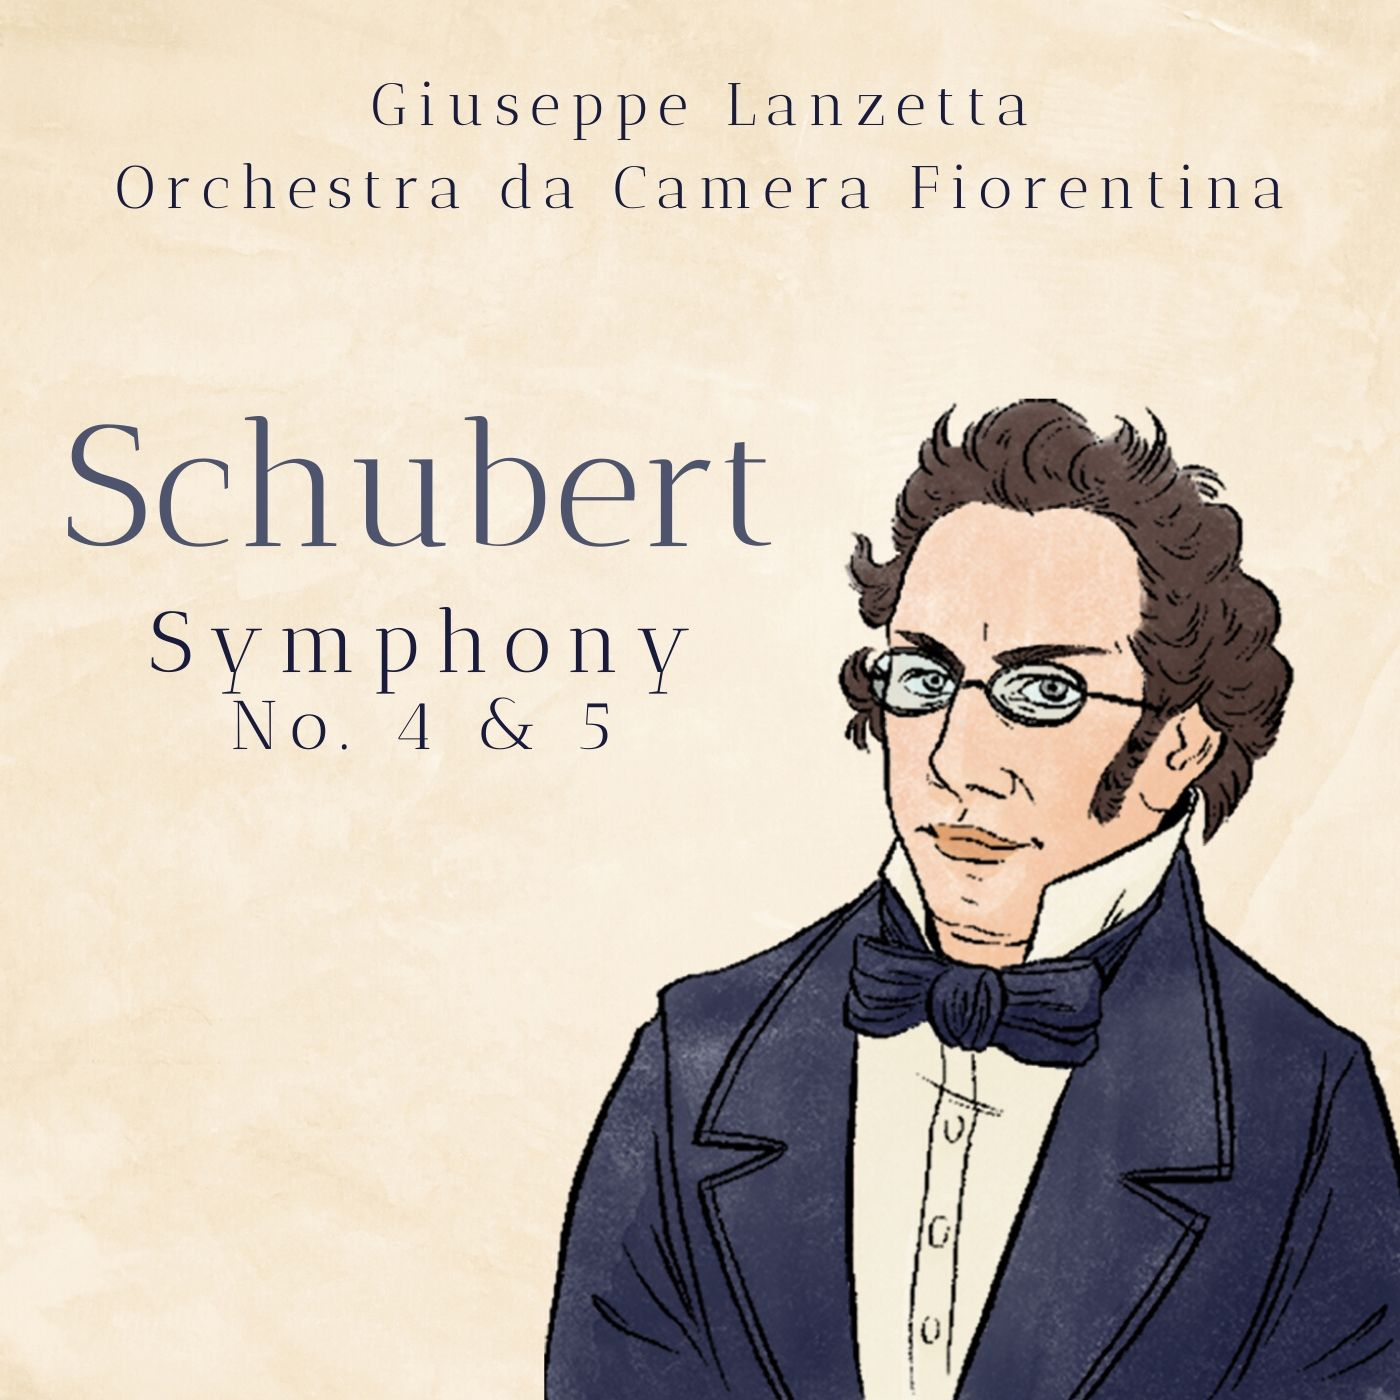 Schubert: Symphony No. 4 & 5